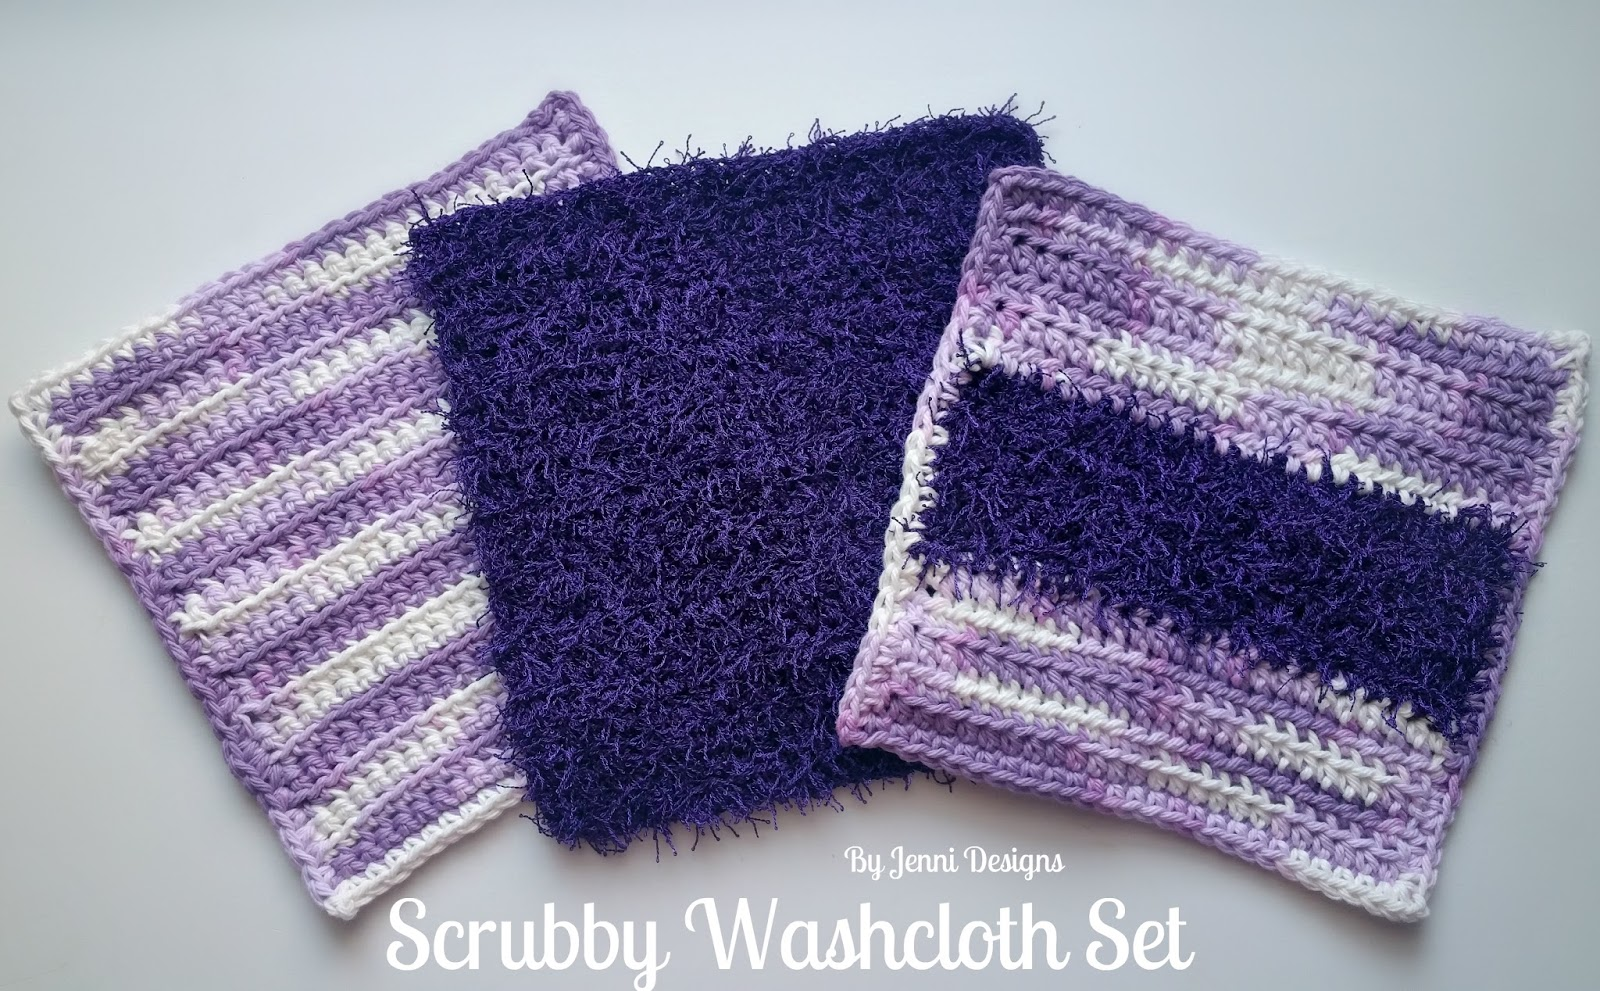 By Jenni Designs: Free Crochet Pattern: Scrubby Washcloth Set